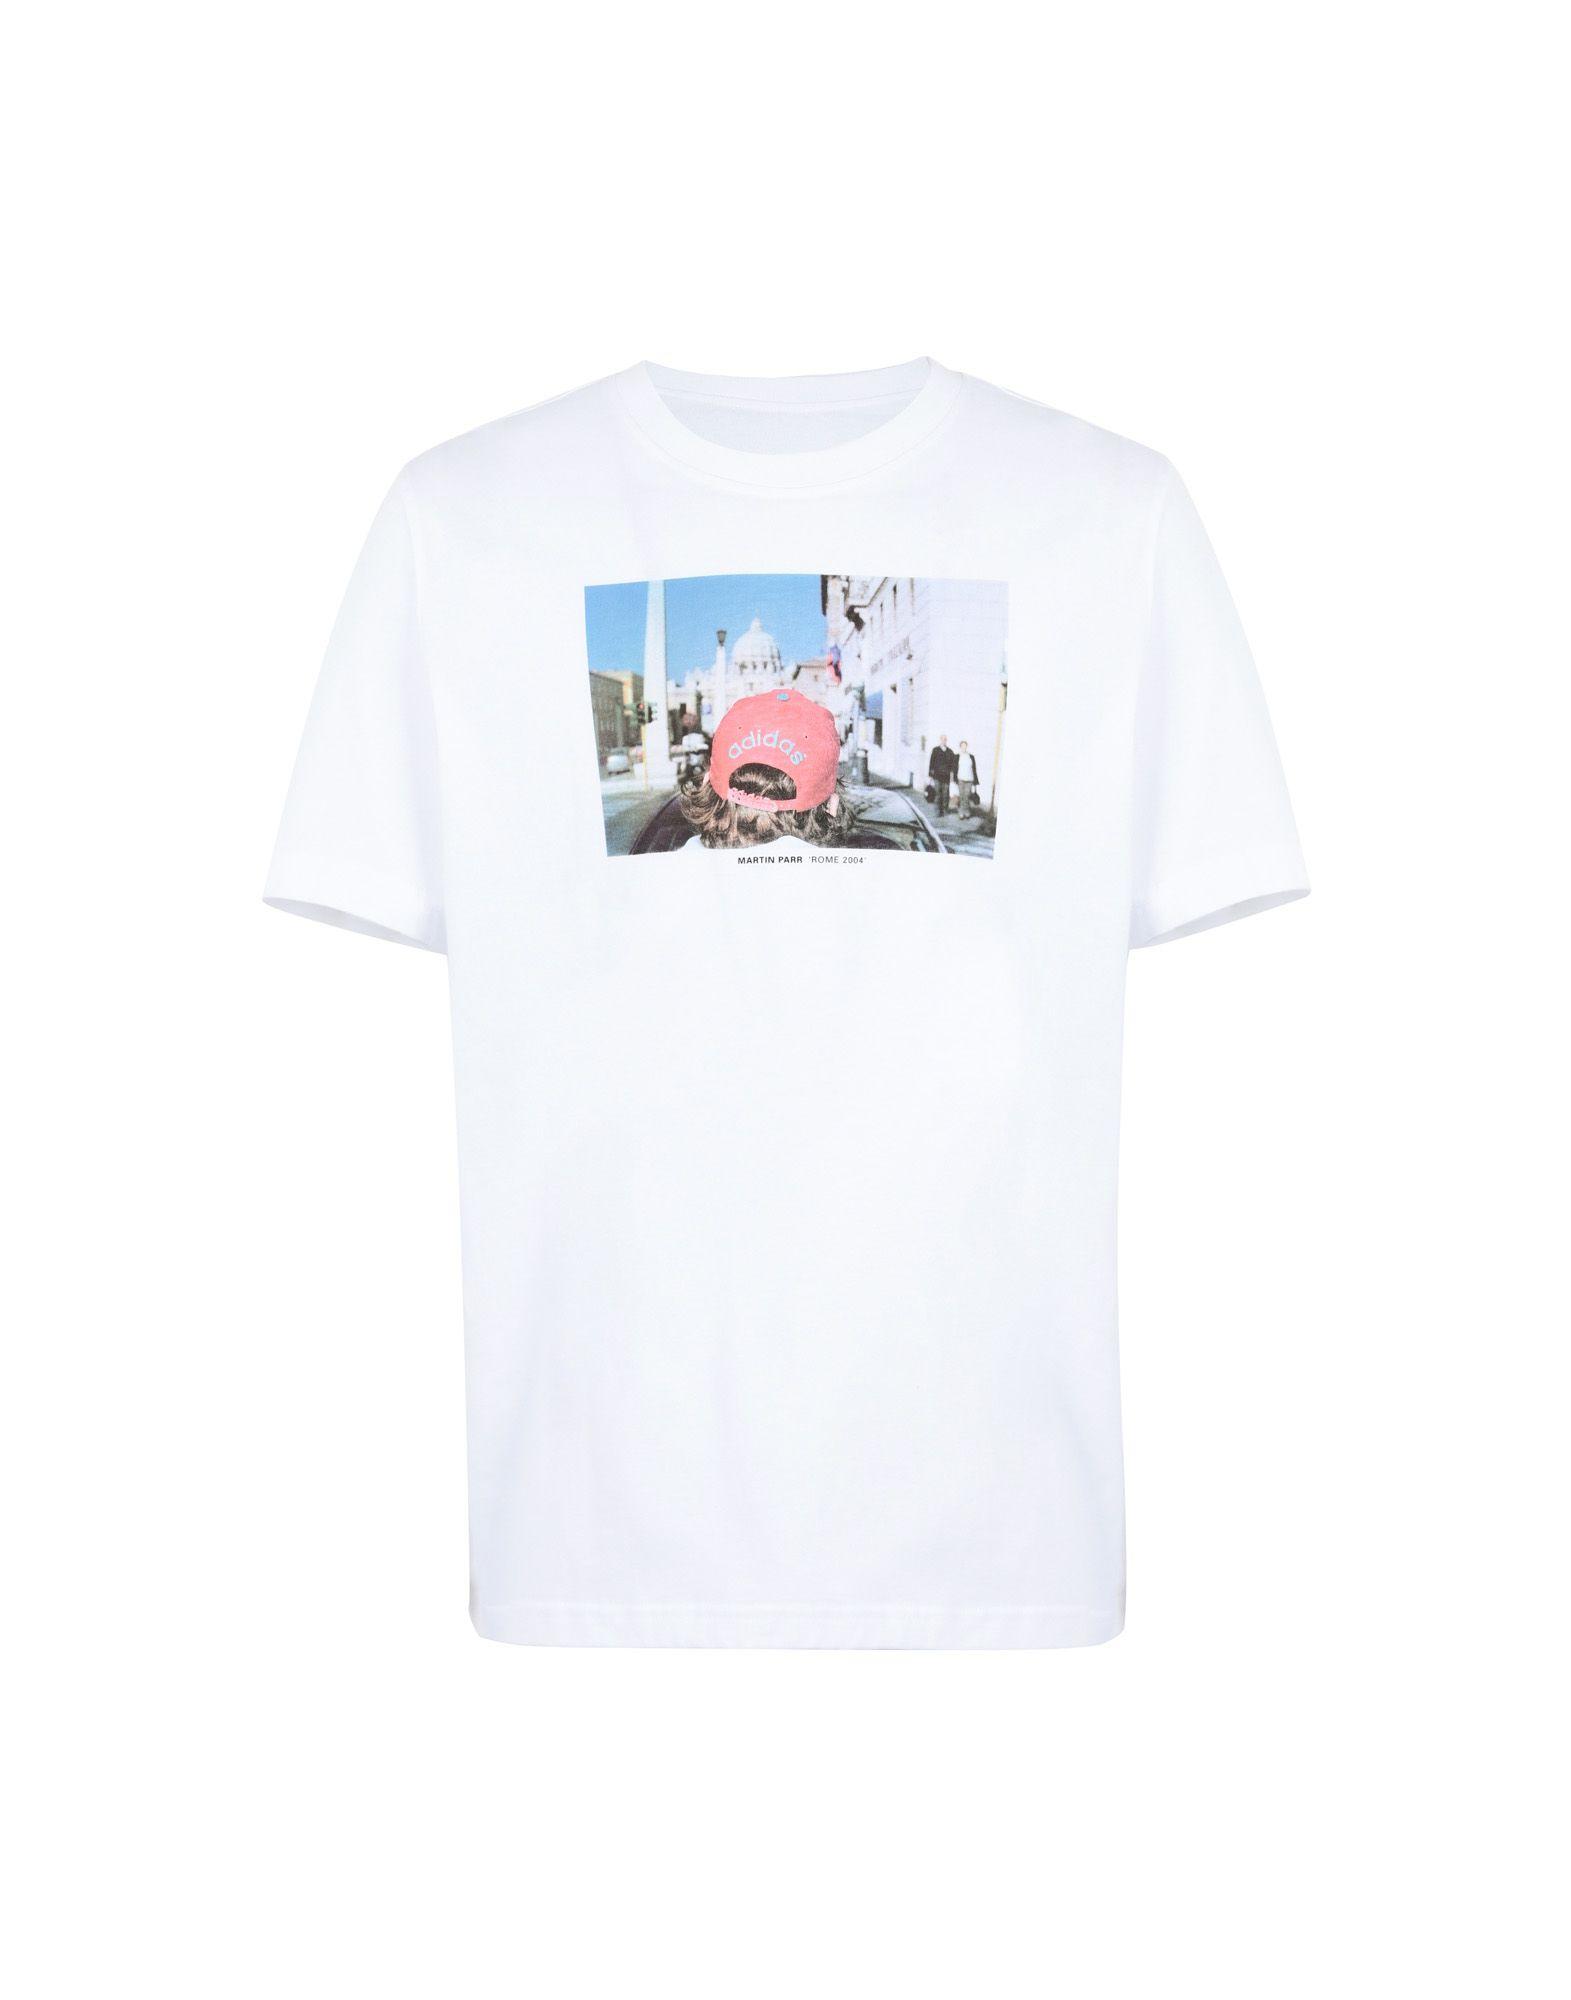 T-Shirt Sportiva Adidas Originals Martn Parr Tee - - uomo - 12297186IG  gute Qualität